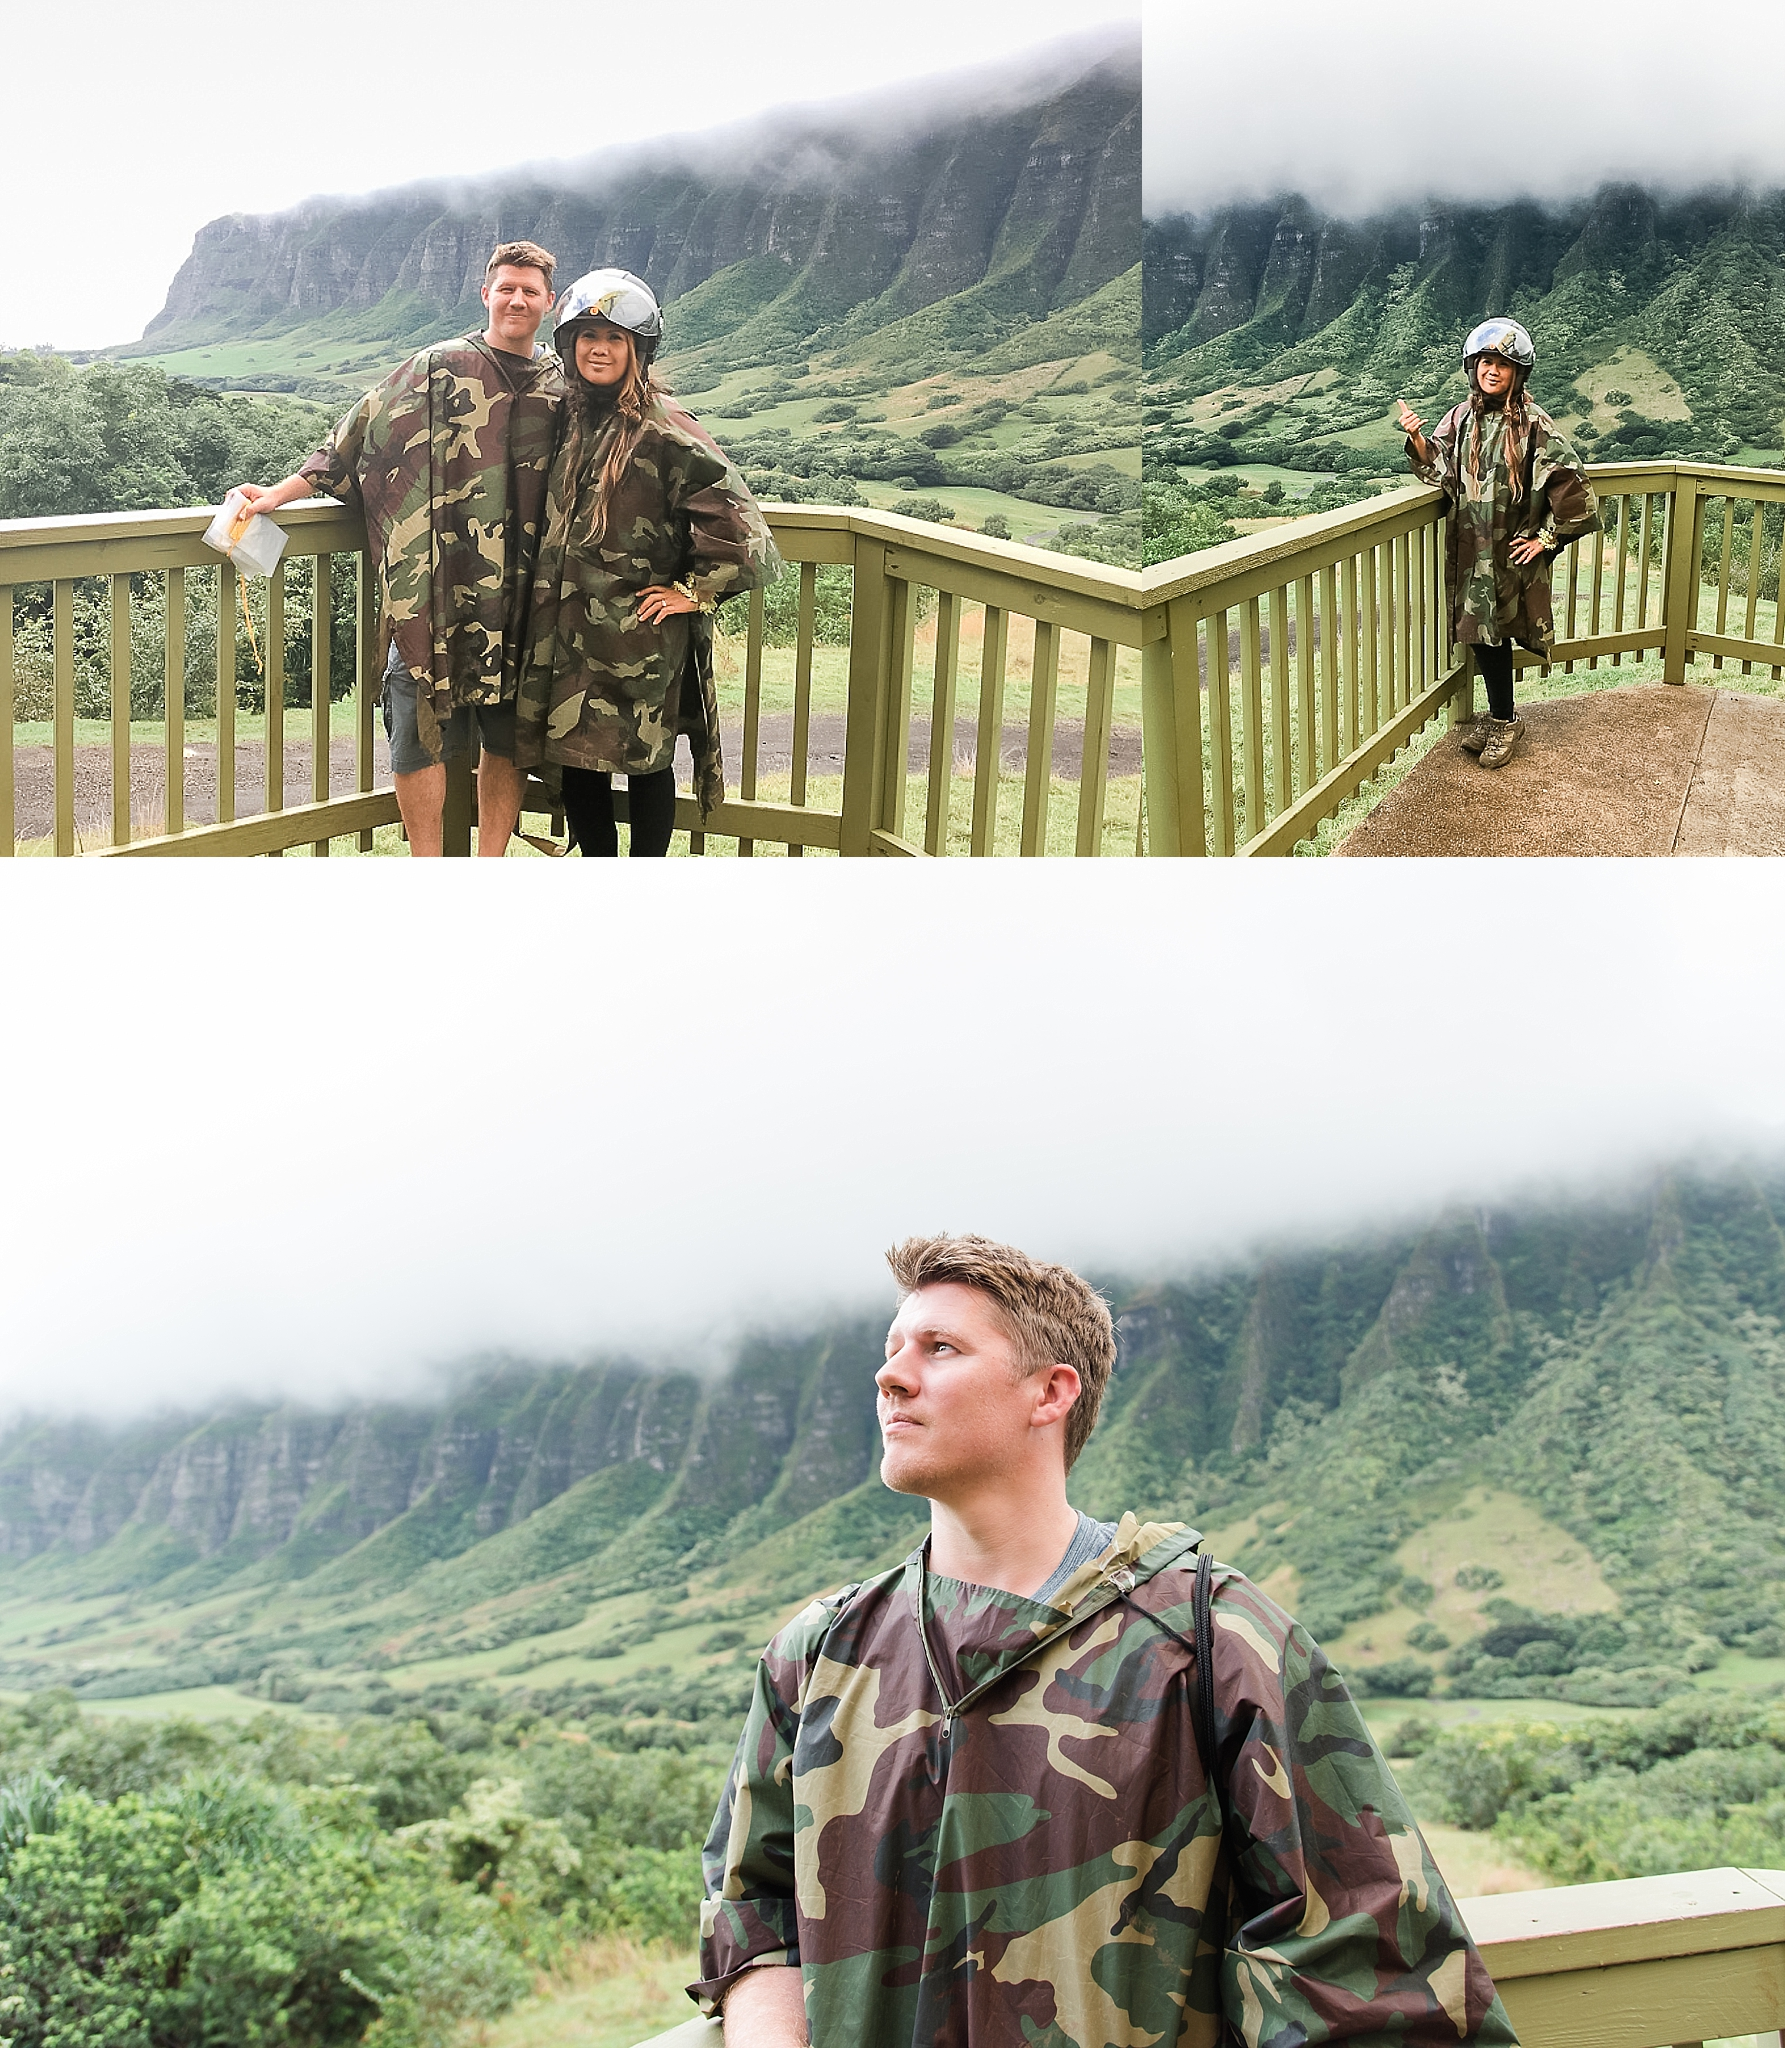 Kualoa Ranch ATV Tour in Oahu, Hawaii. Photos by Jade Min Photography.